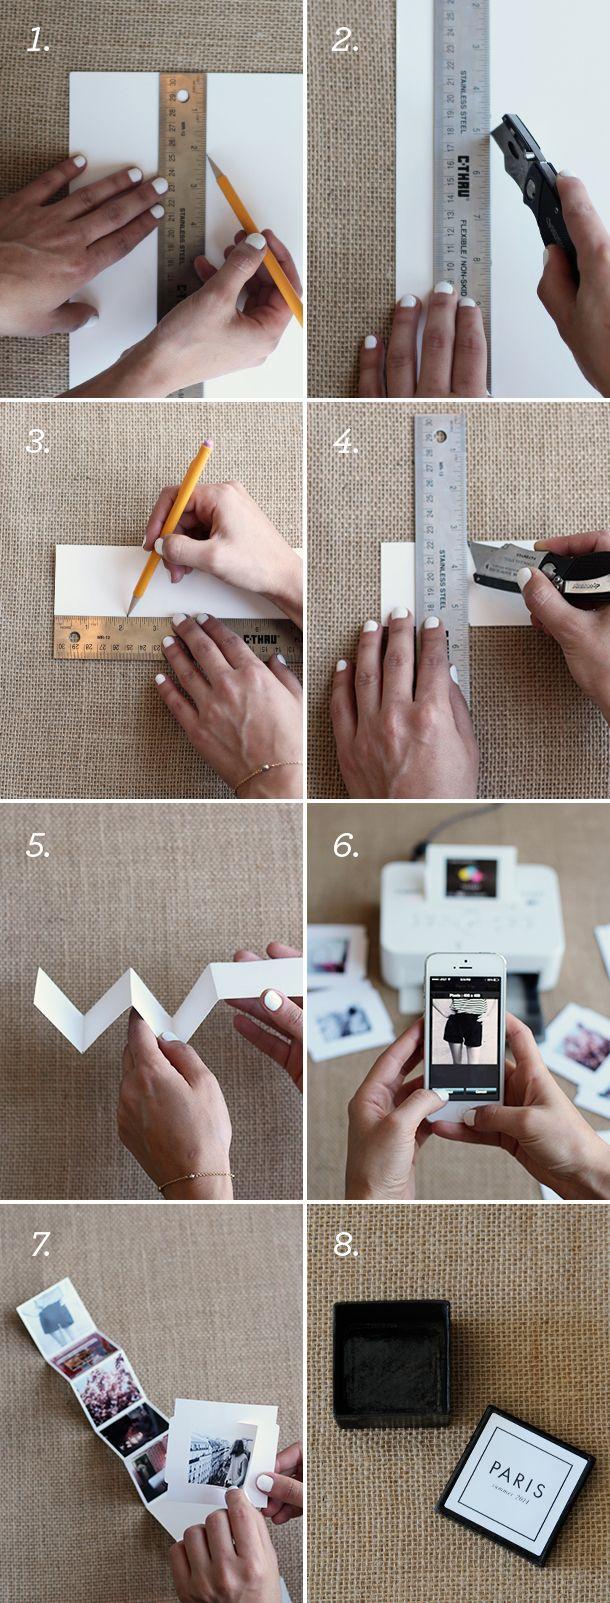 10 DIY Foto-Ideen: SO könnt ihr eure Bilder kreativ in Szene setzen ...